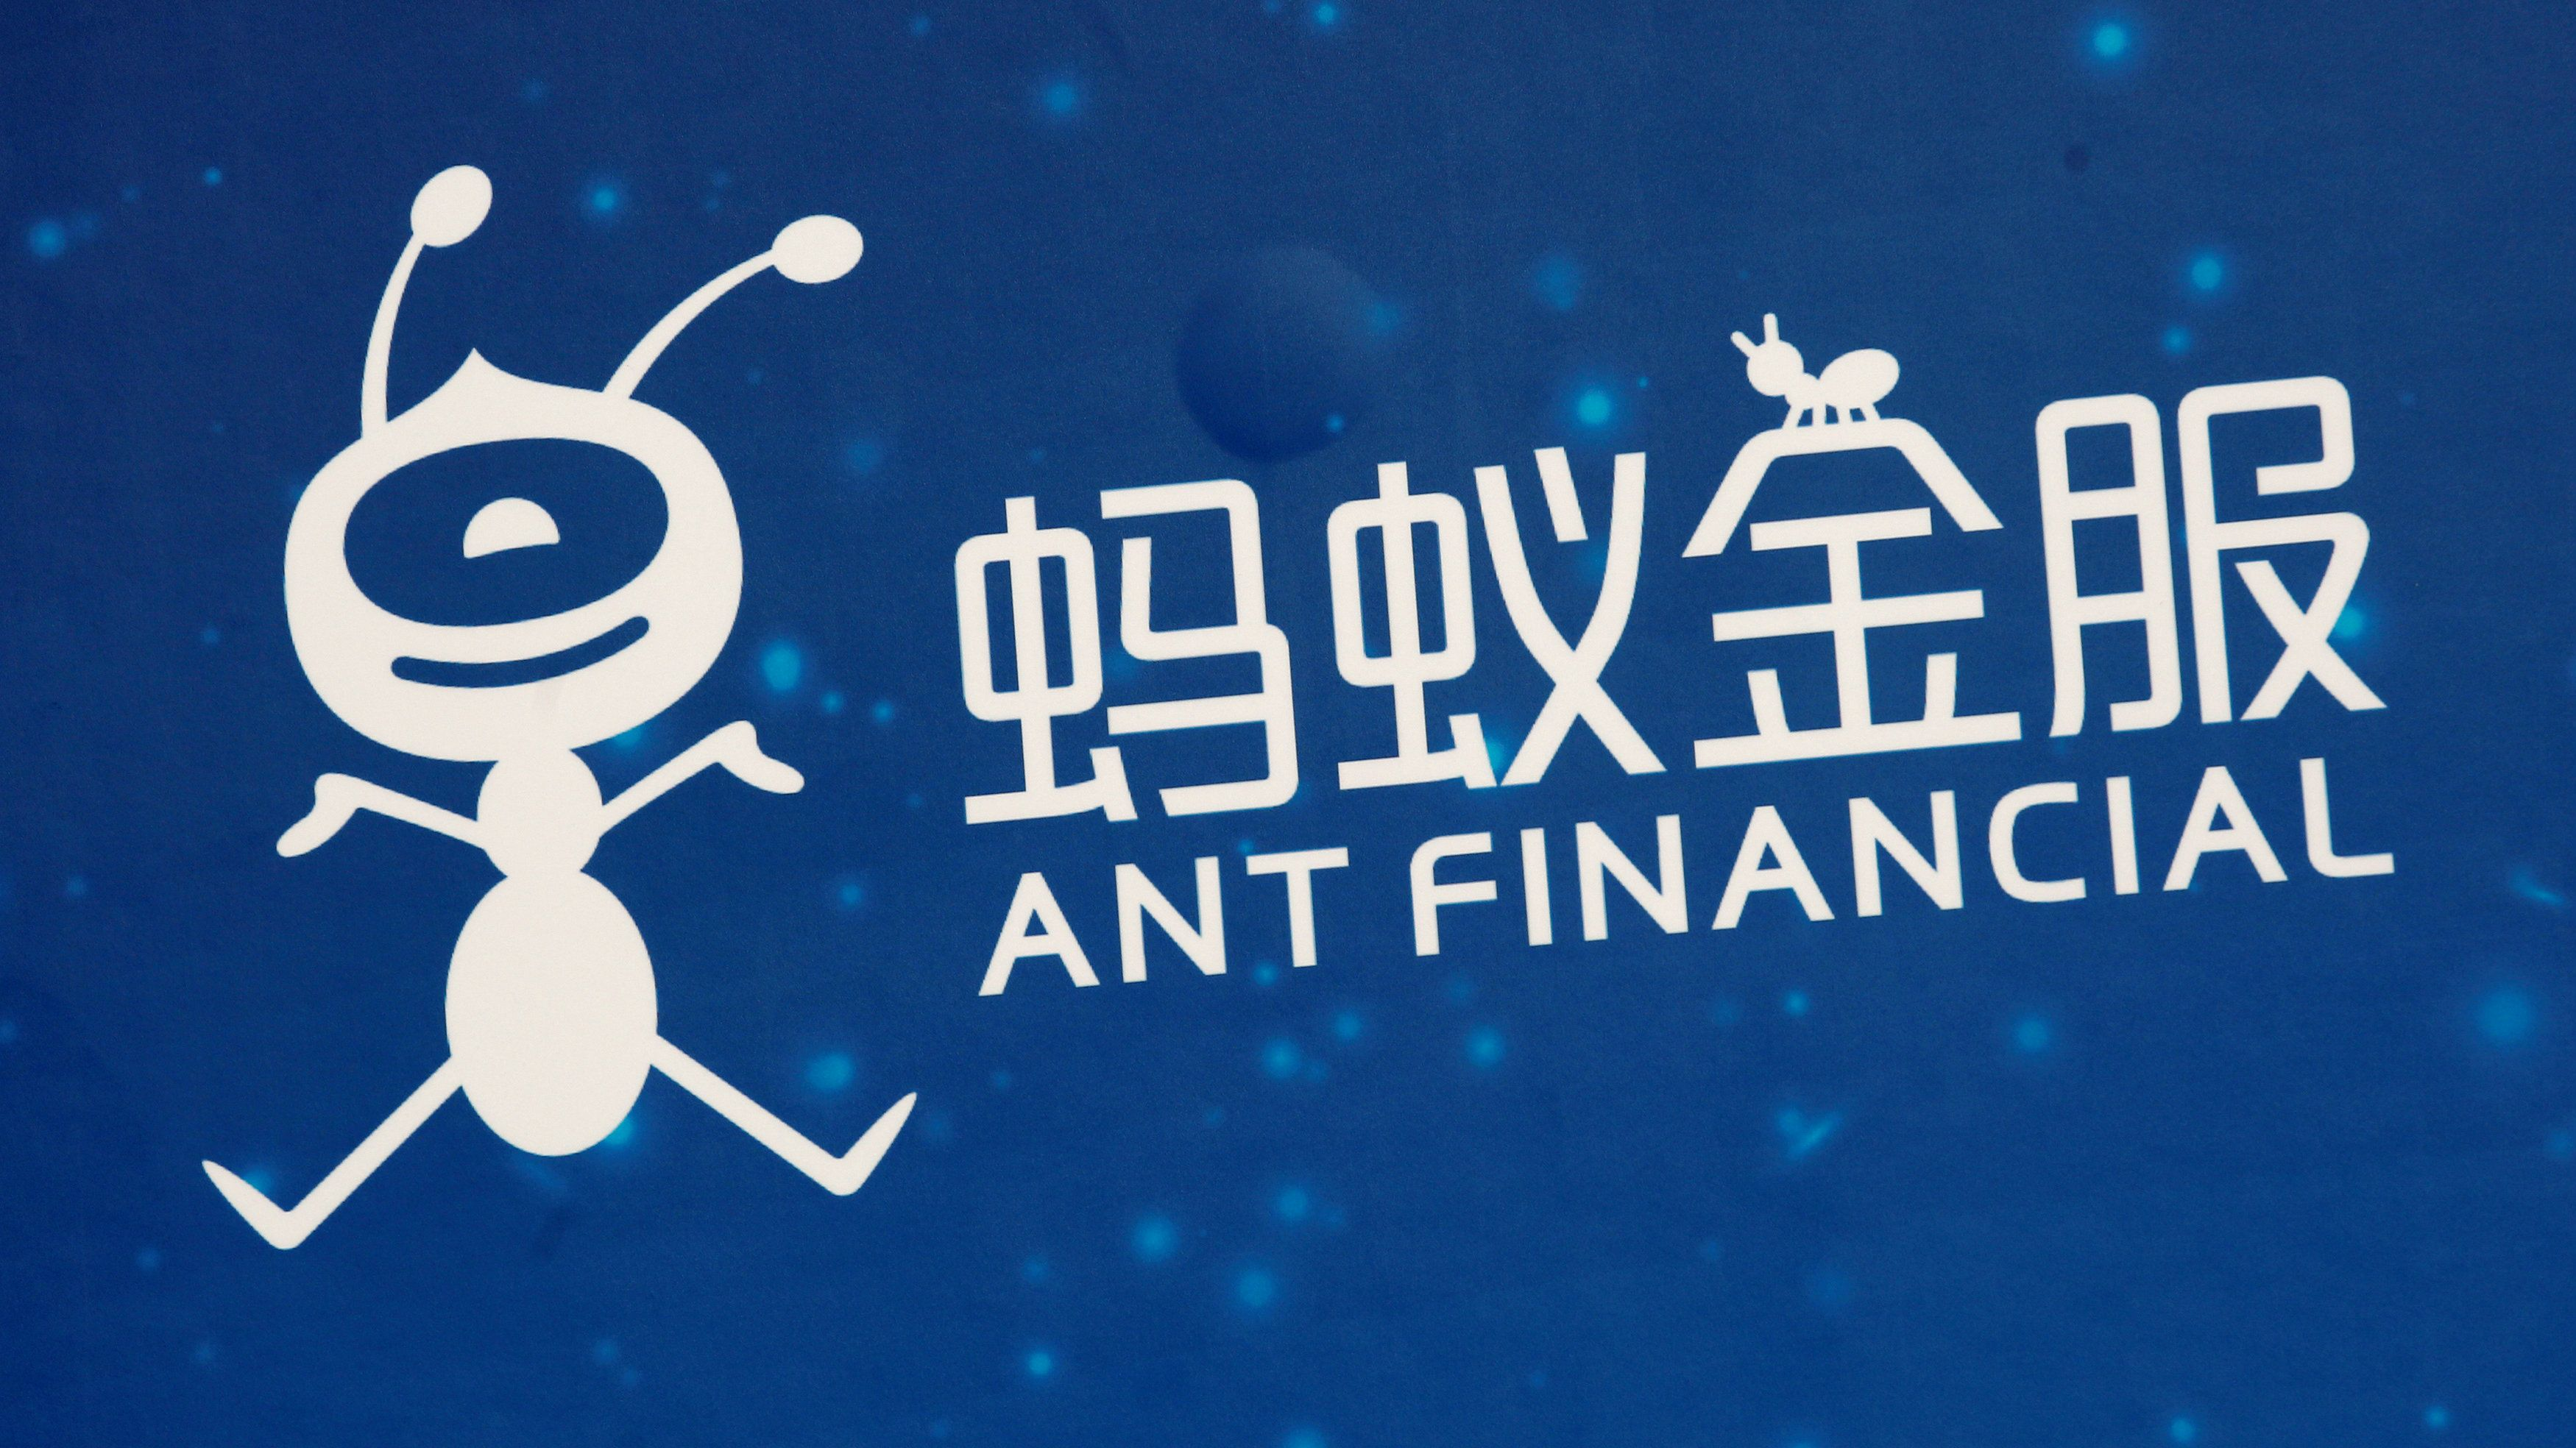 ant_financial.jpg